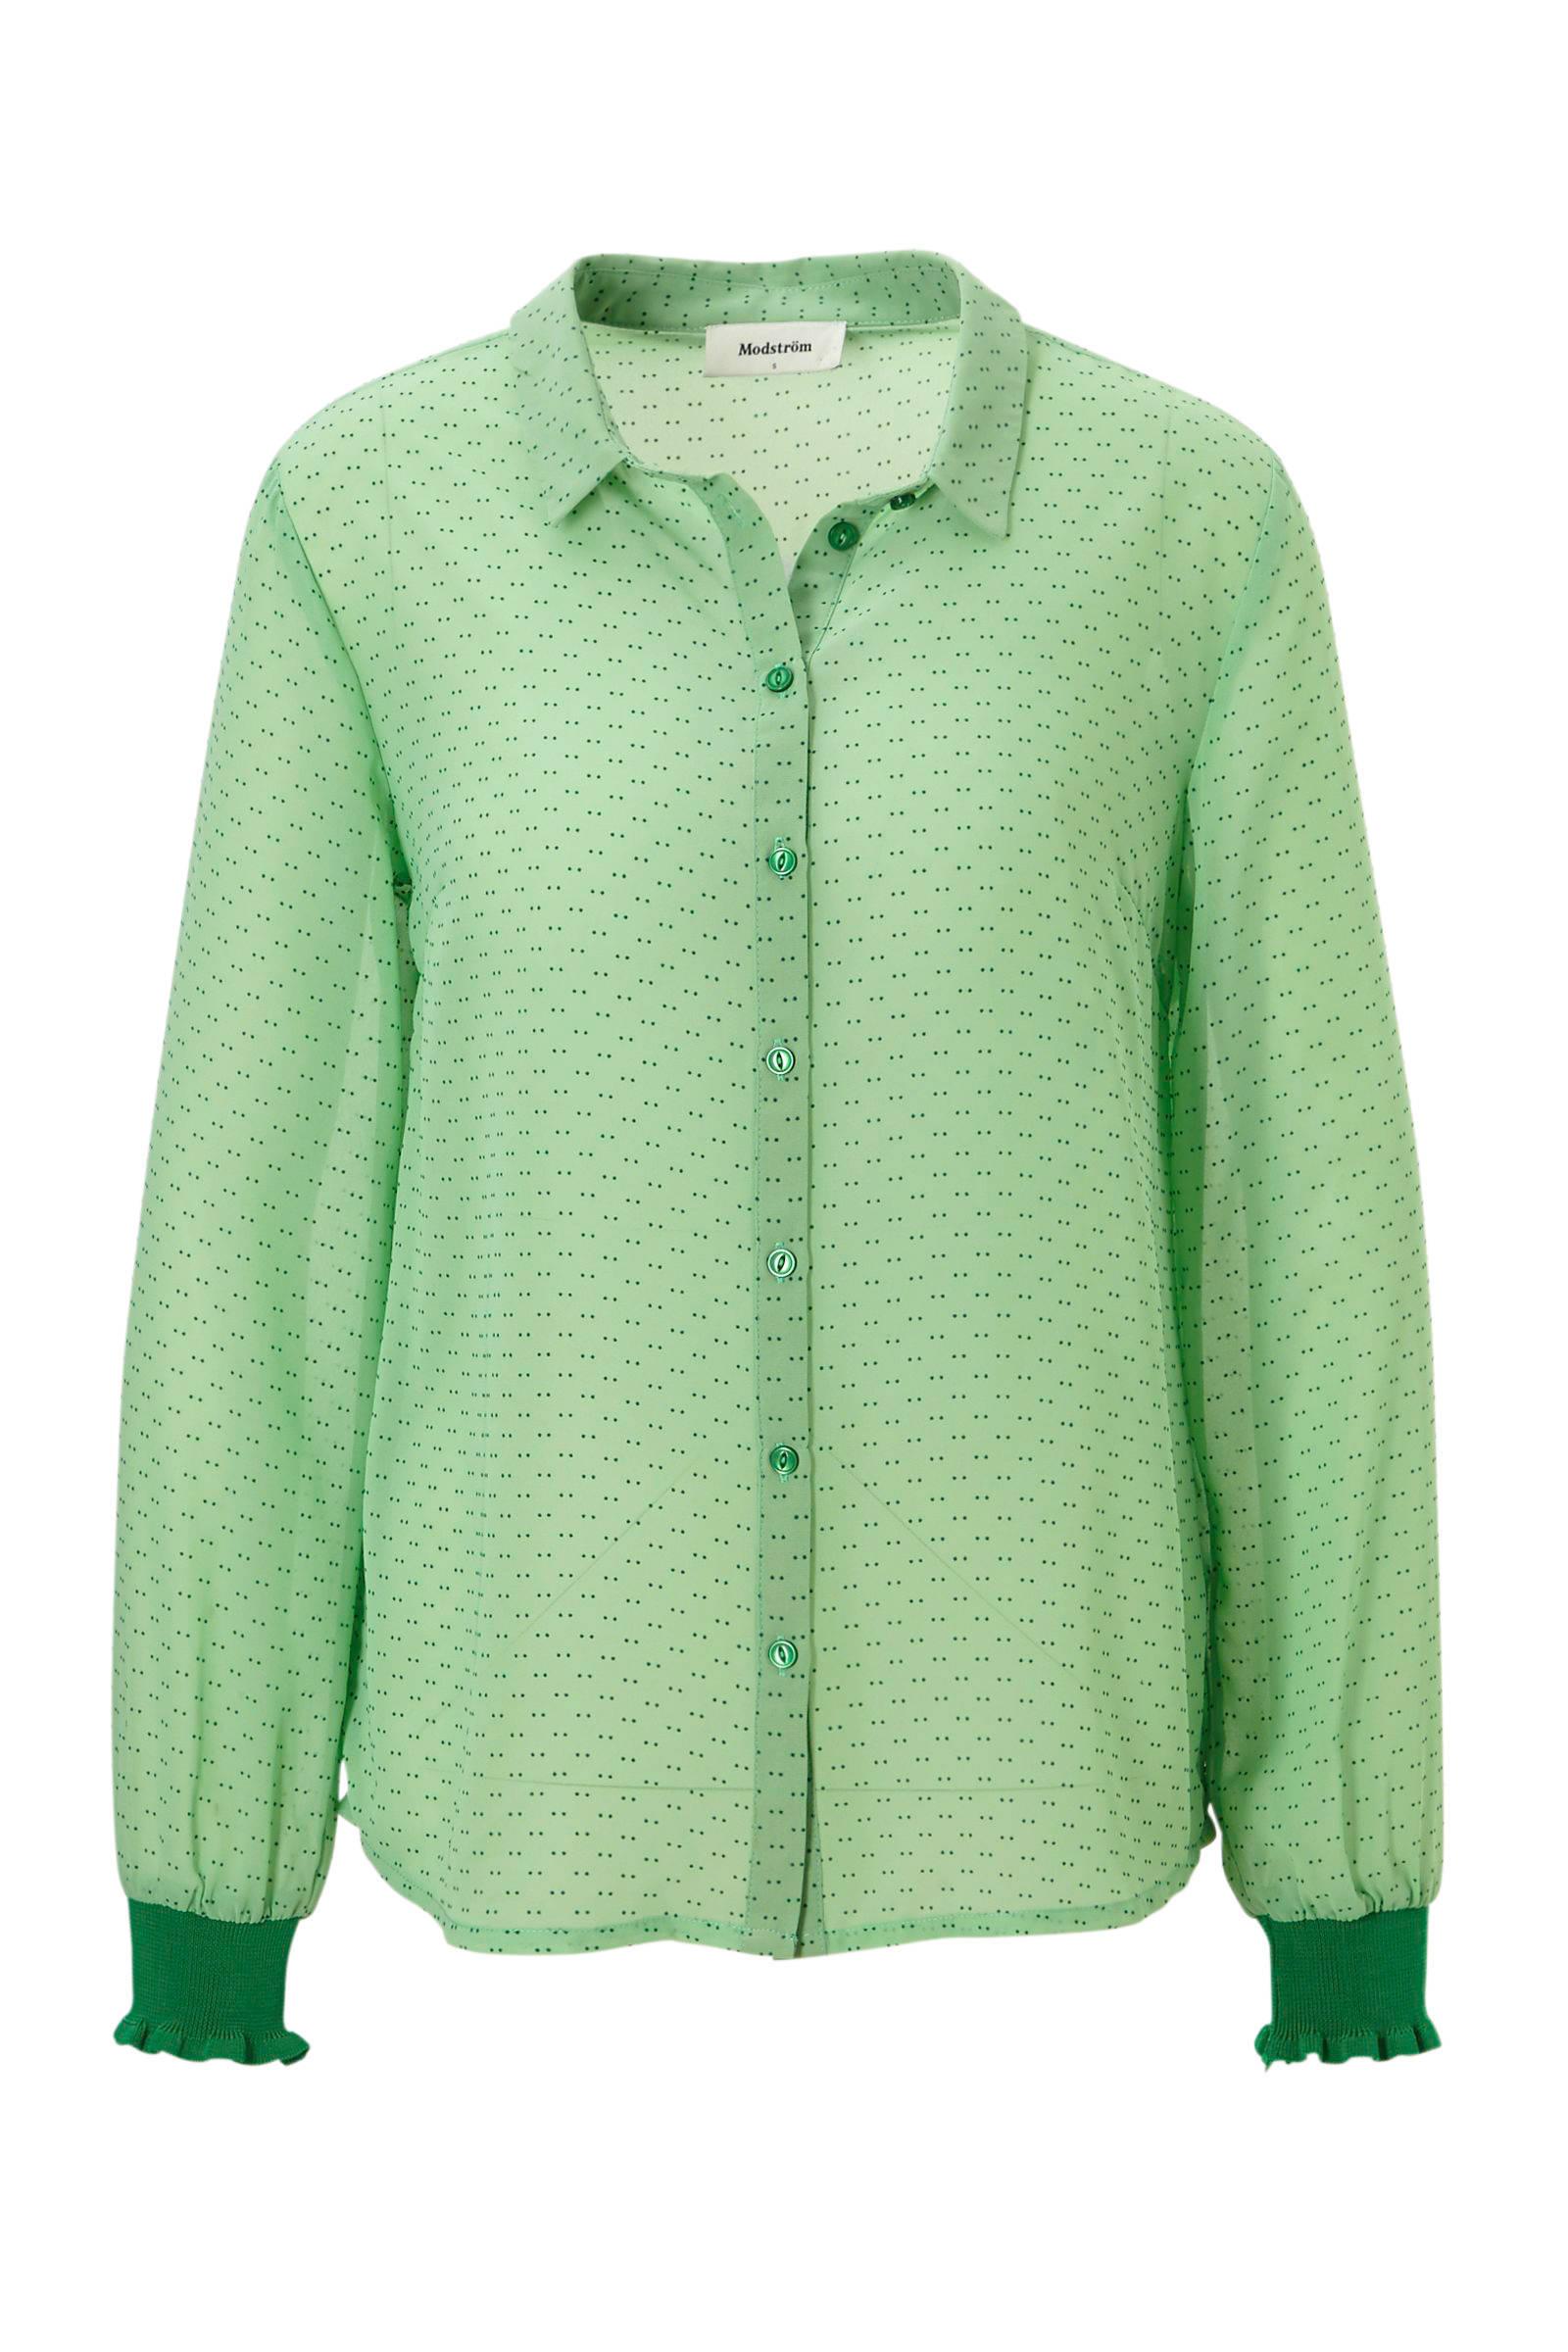 mintgroene blouse dames